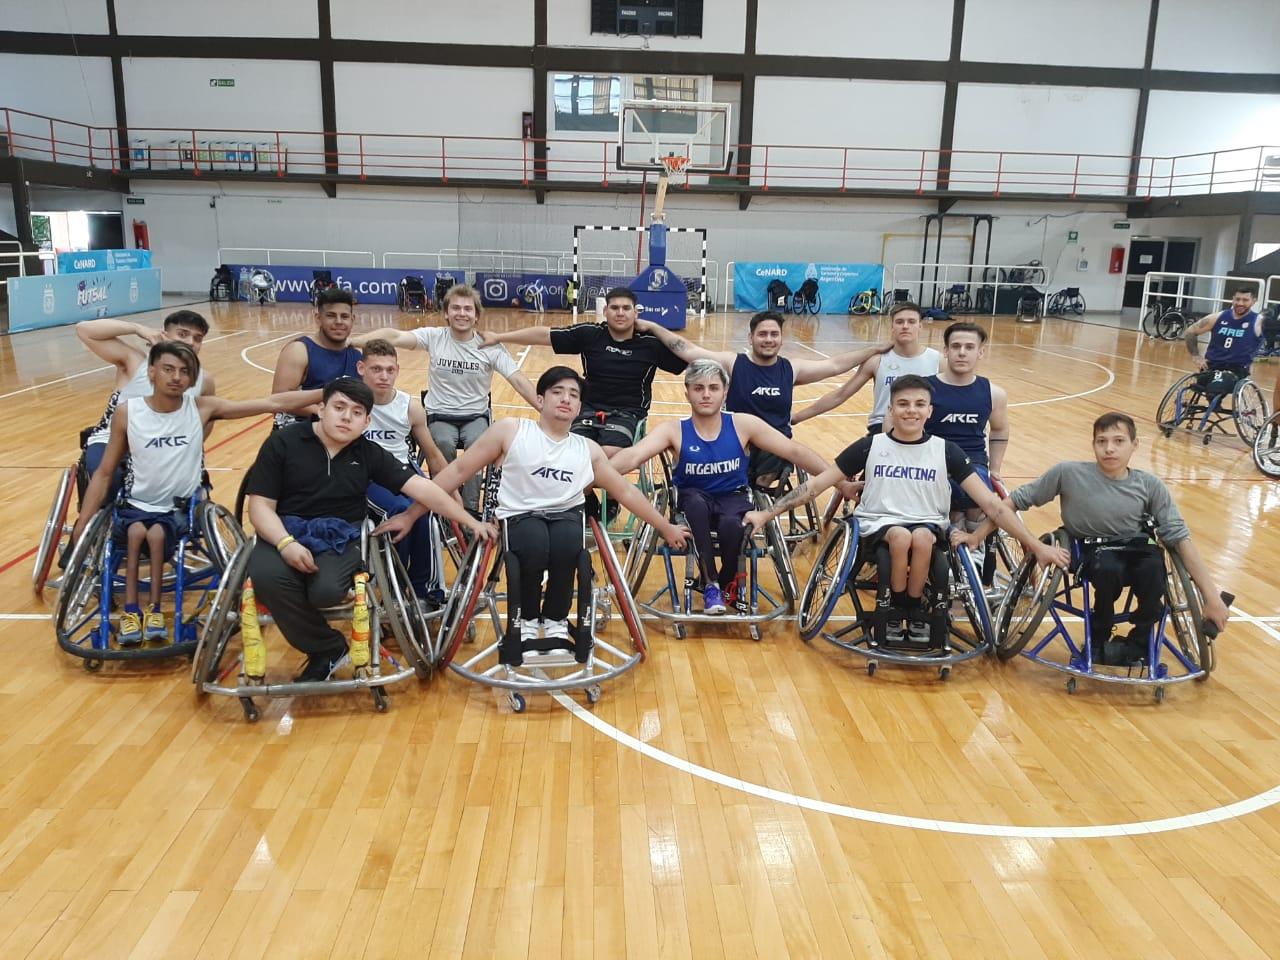 U21 wheelchair basketball in CeNARD